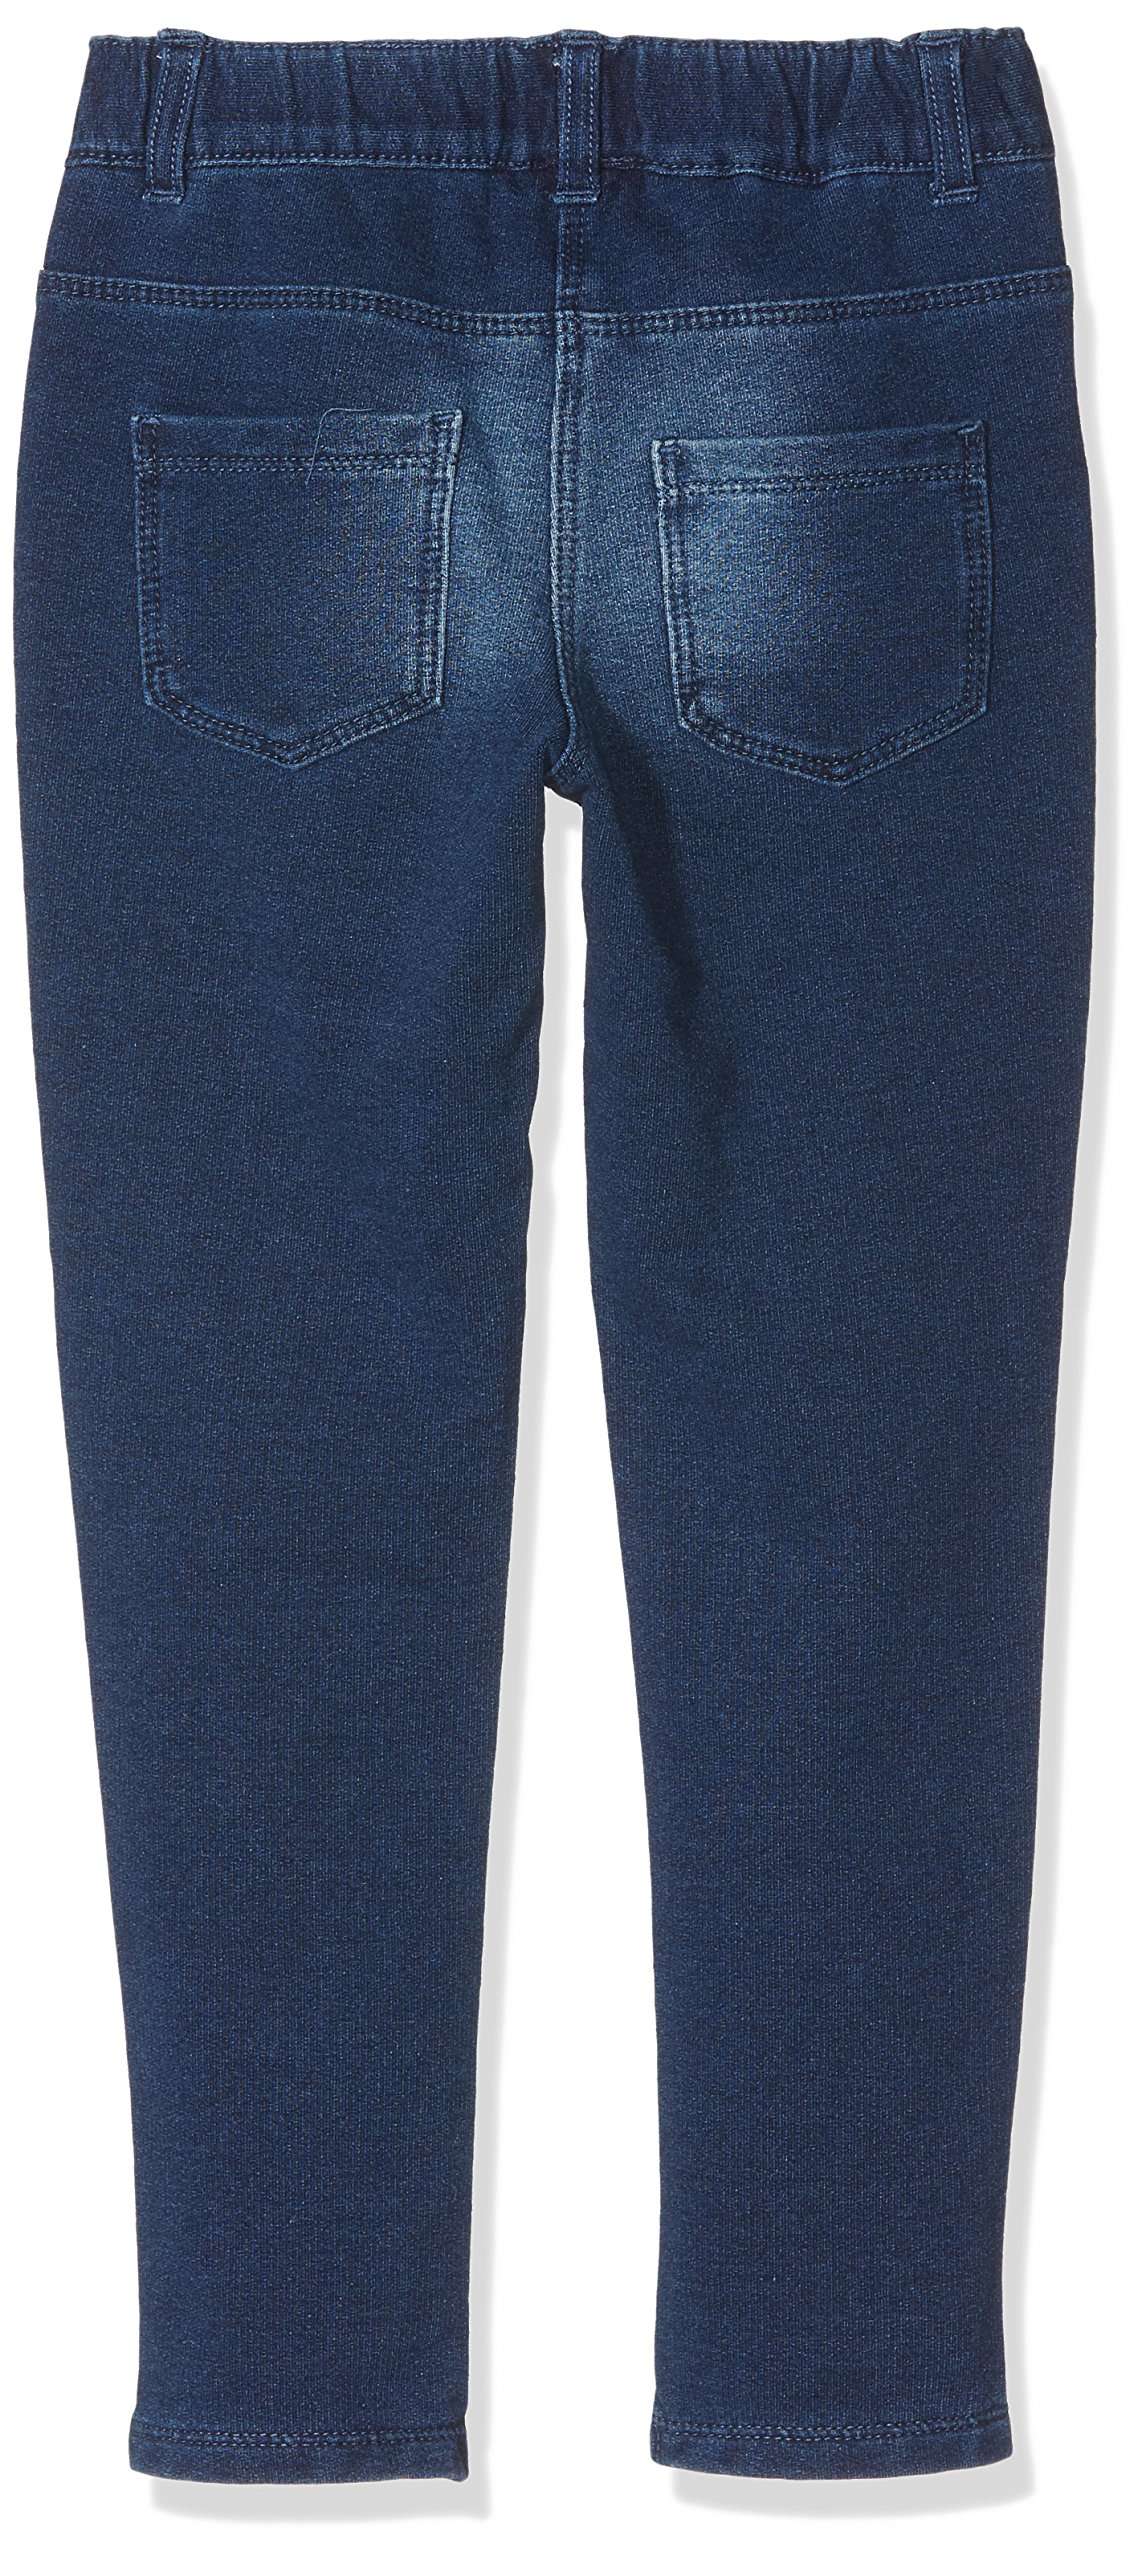 boboli Pantalones para Bebés 2